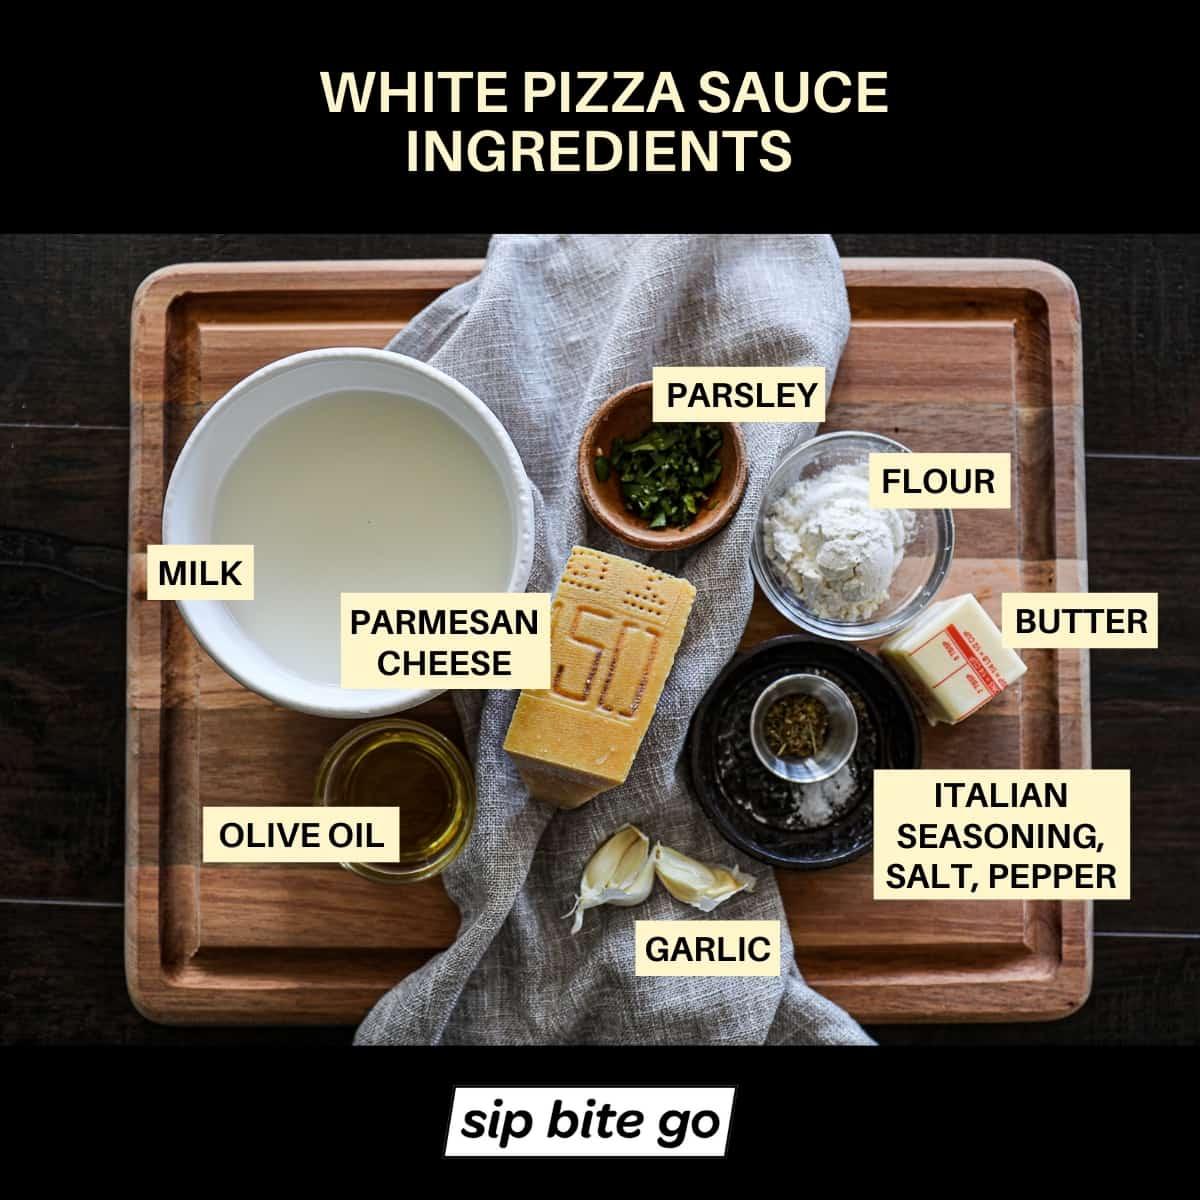 White Pizza Sauce Ingredients List Chart including milk, parmesan cheese, flour, parsley, italian seasonings.